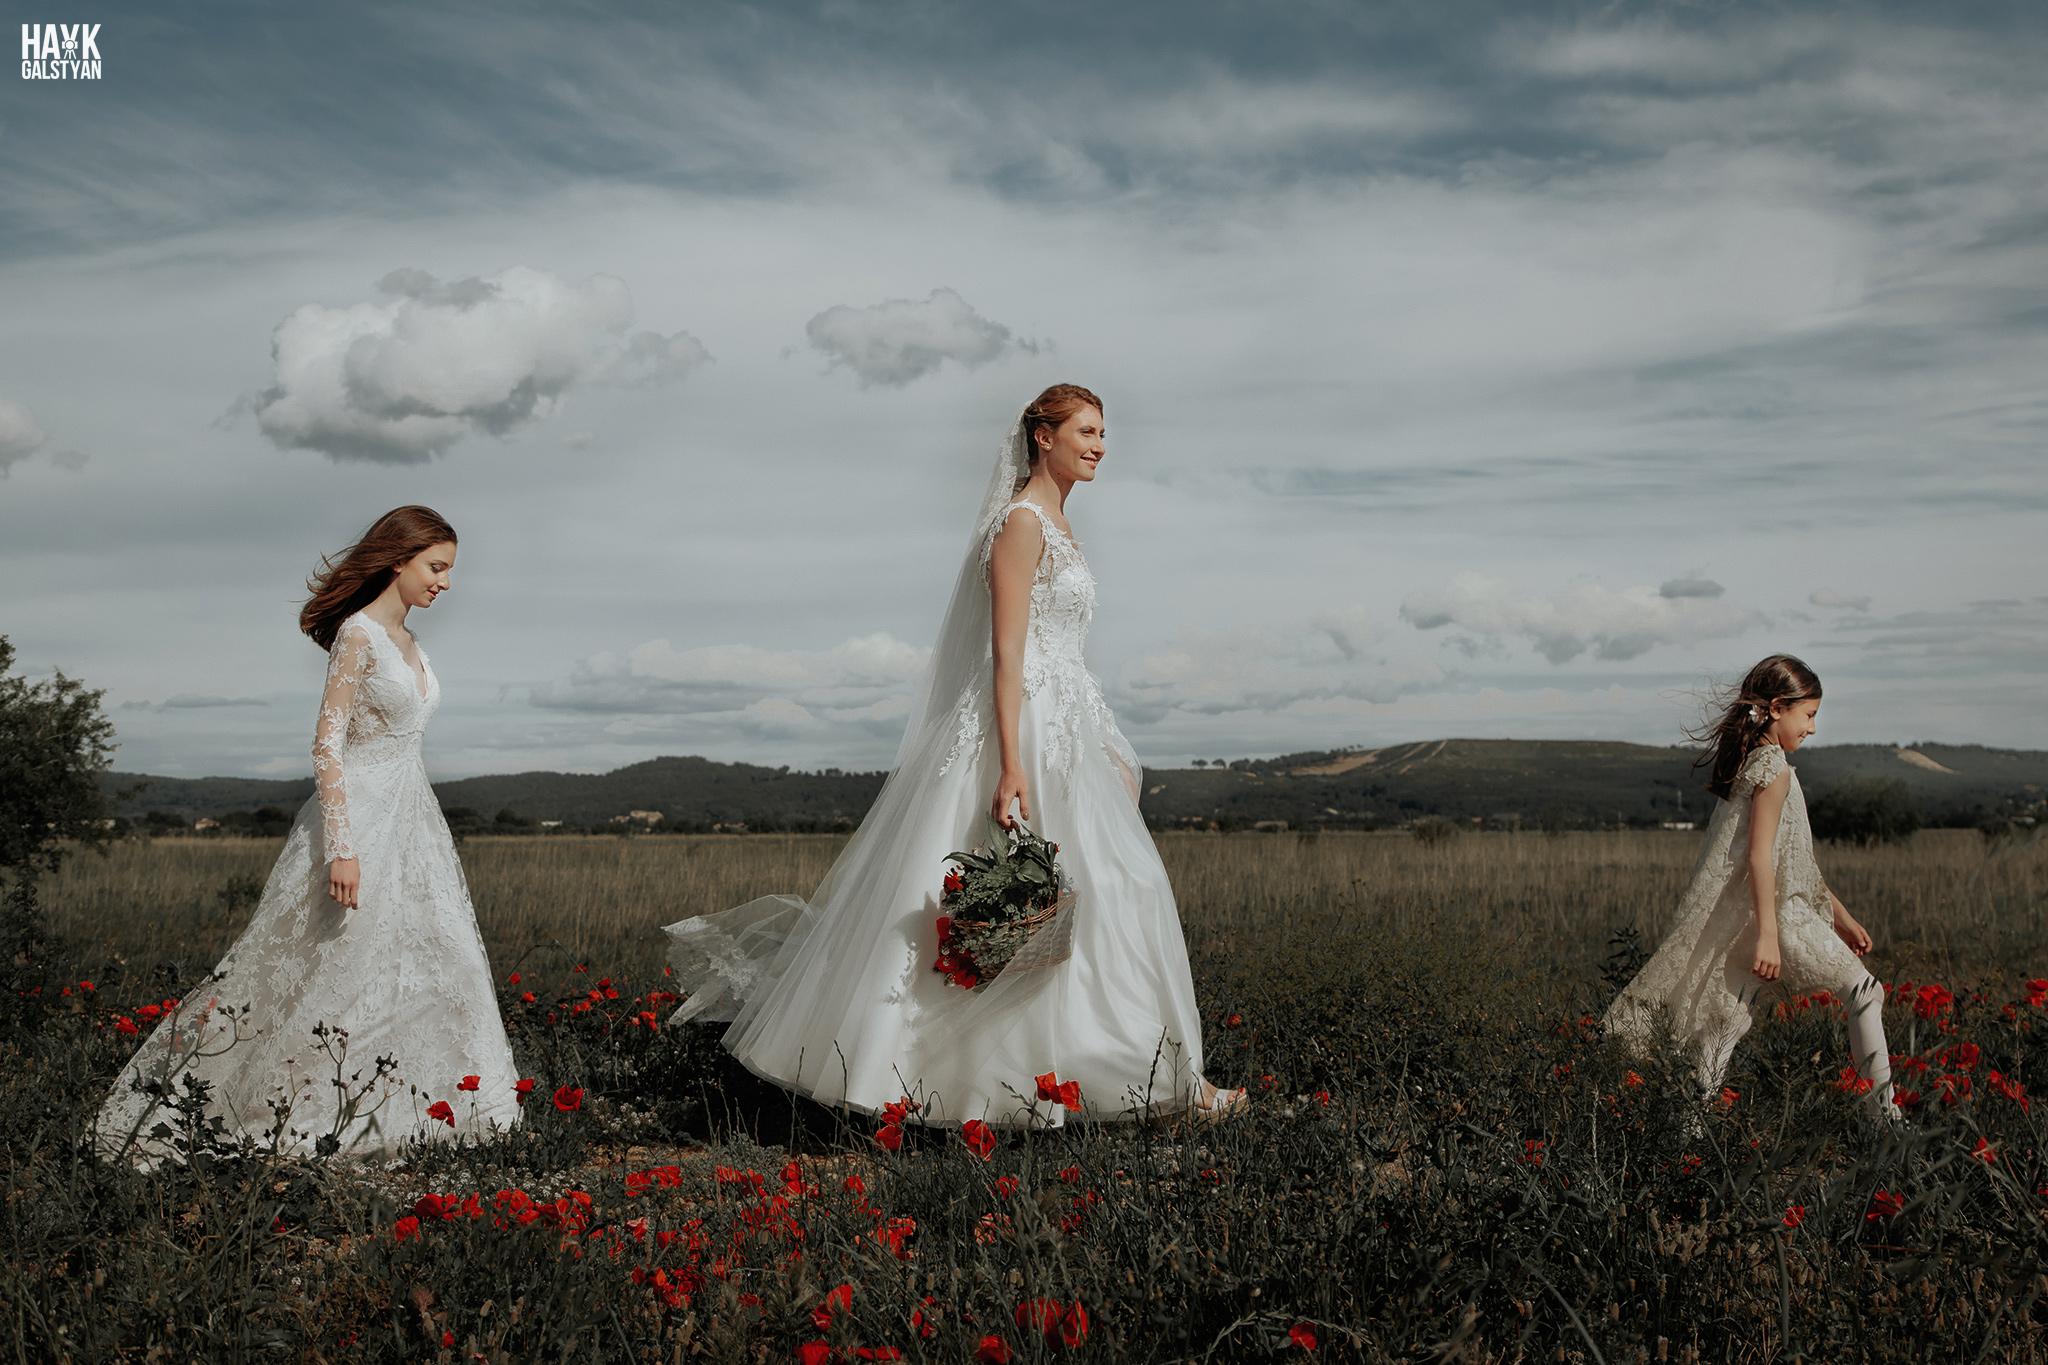 Wedding photography bride by Photographer Hayk Galstyan